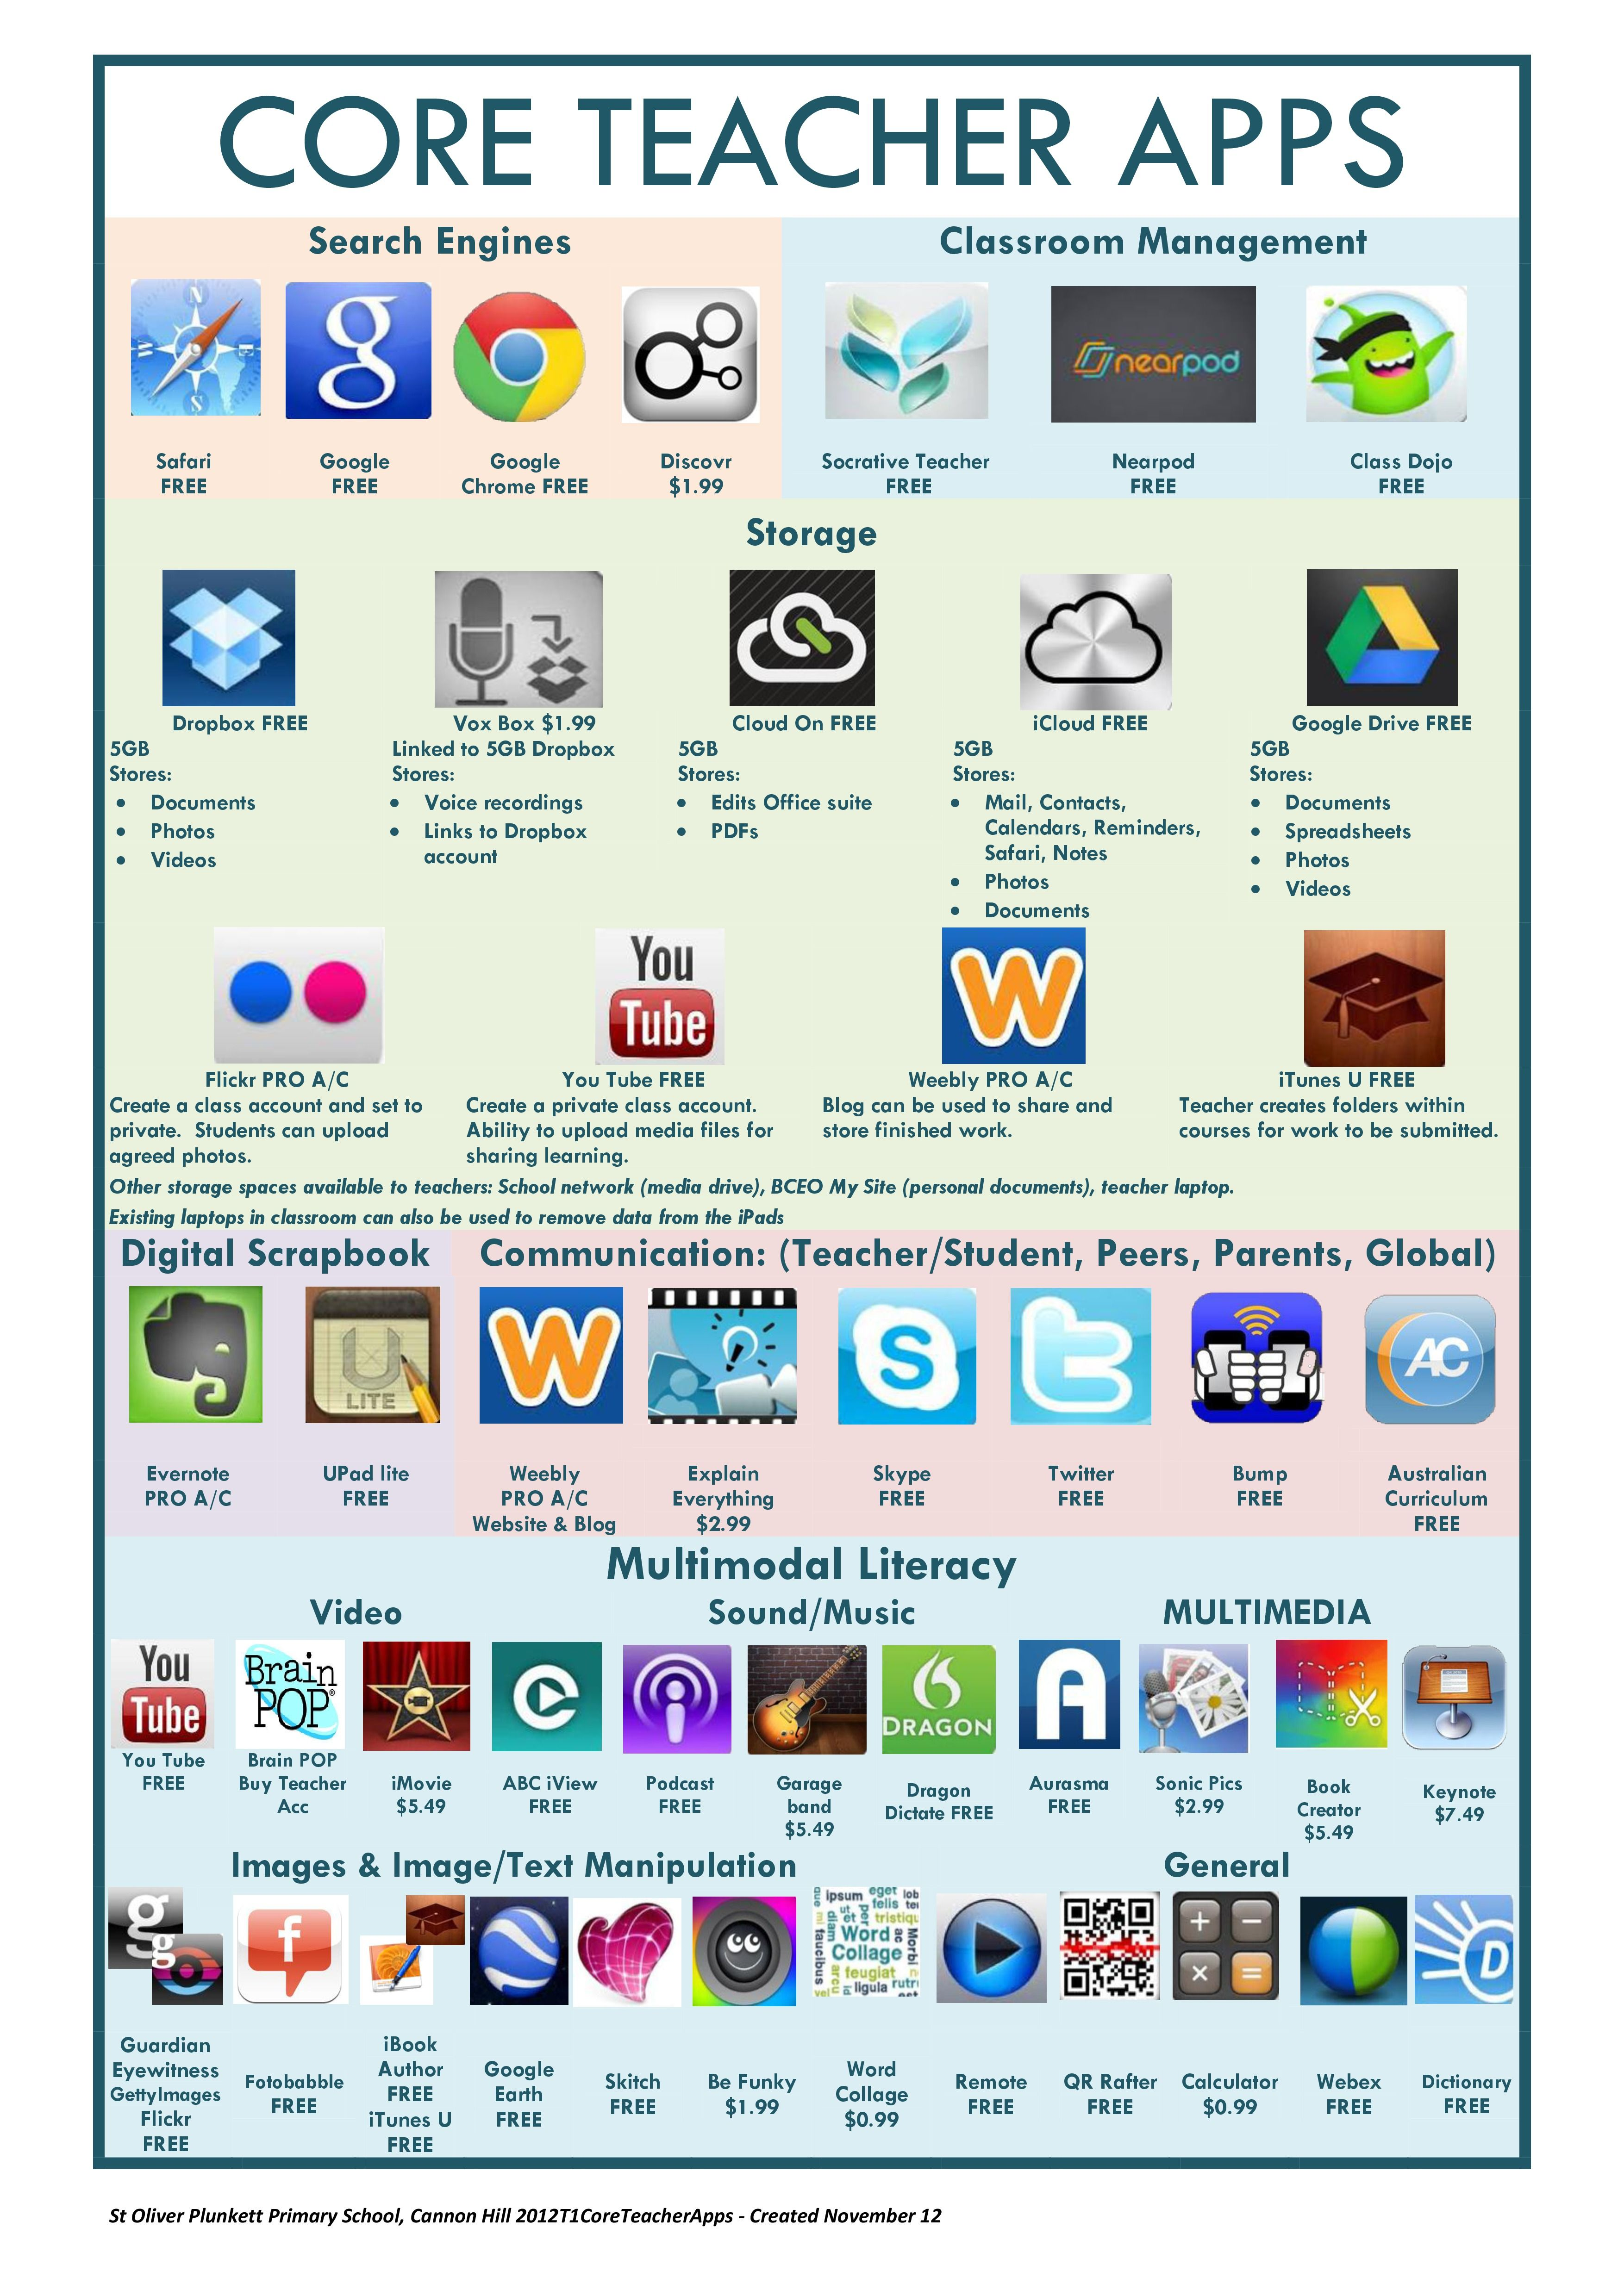 Core teacher apps for iPad Apps for teachers, Teaching